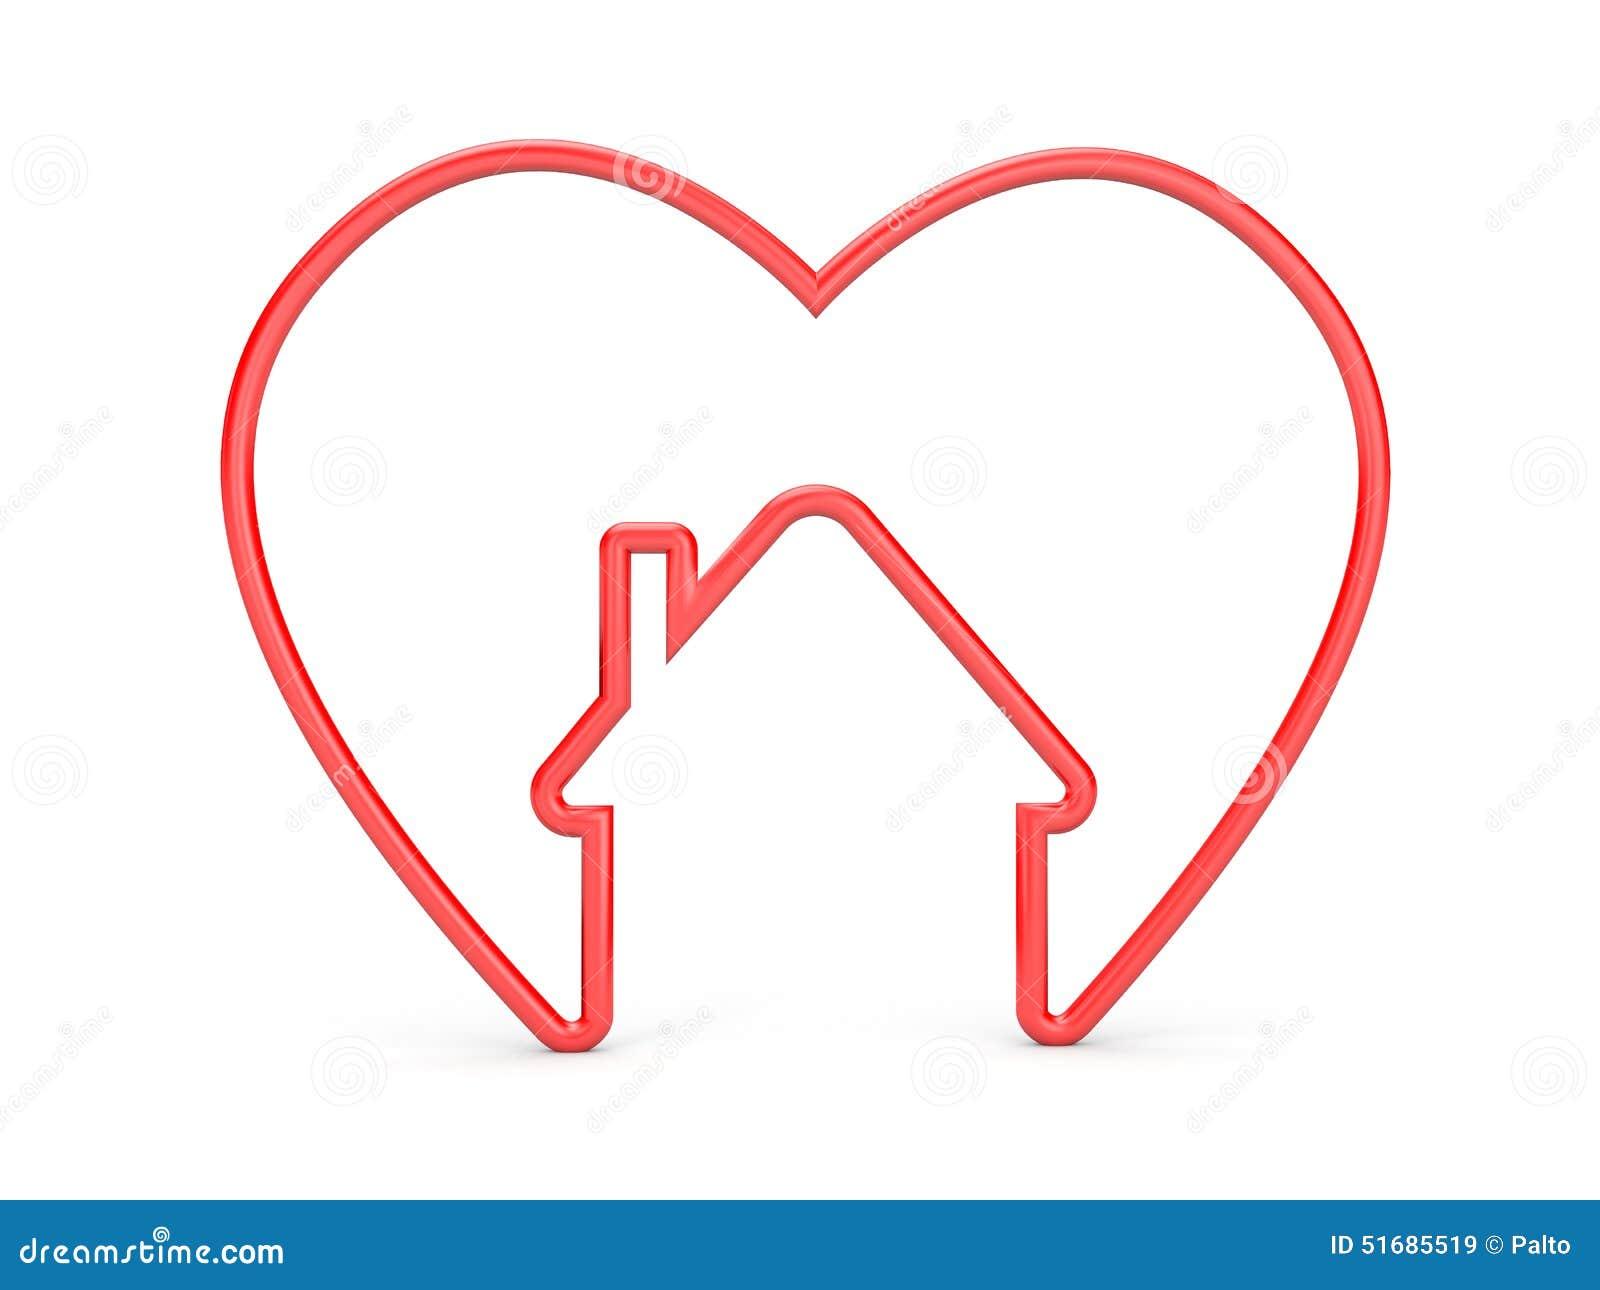 coeur avec la forme de maison illustration stock image 51685519. Black Bedroom Furniture Sets. Home Design Ideas